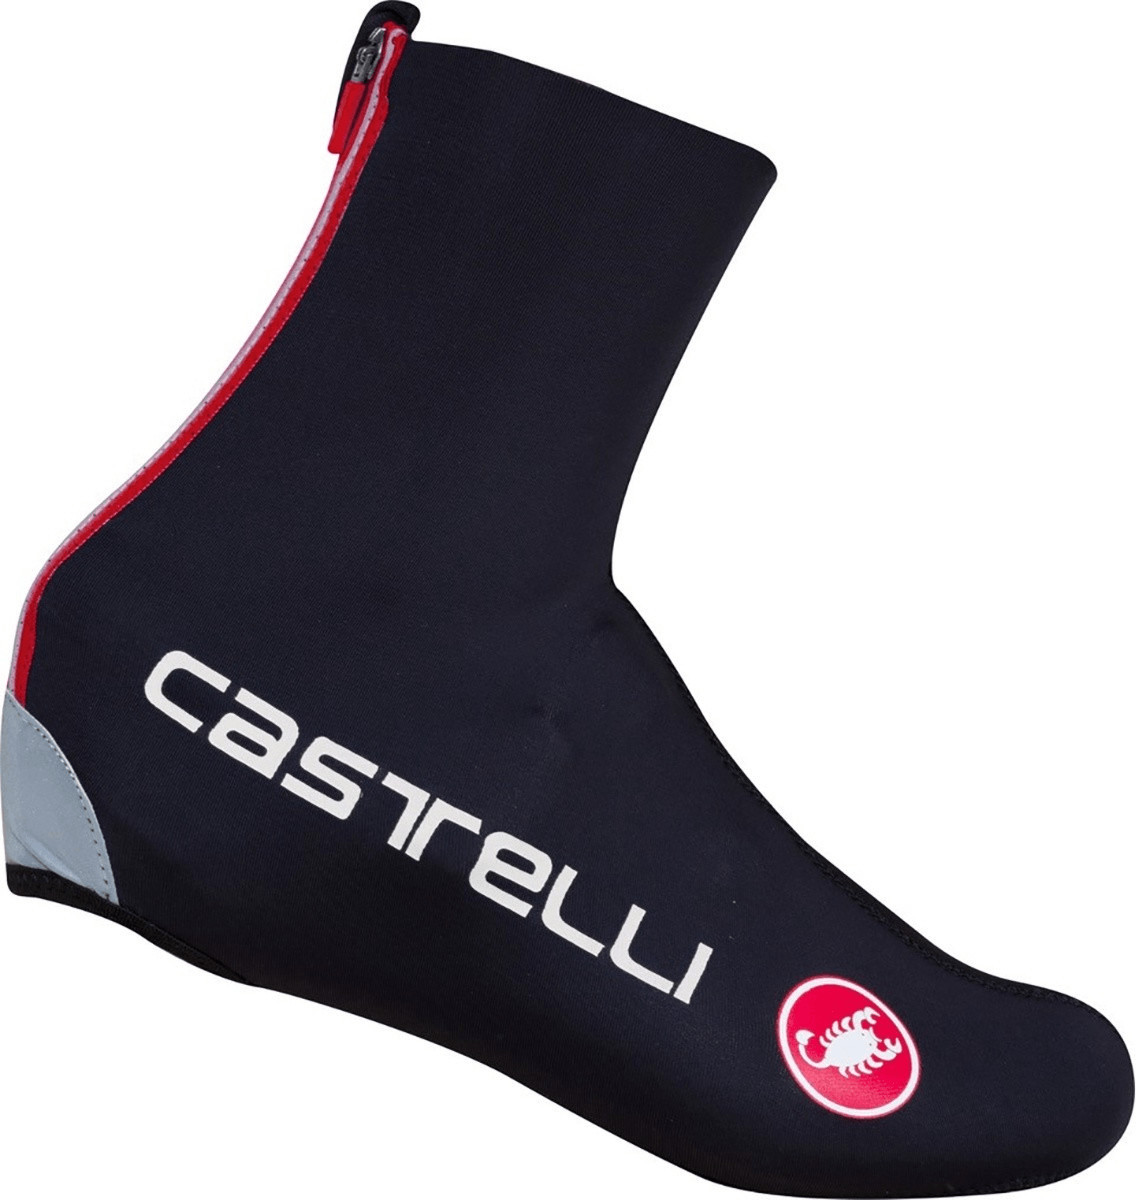 Castelli Diluvio C schwarz